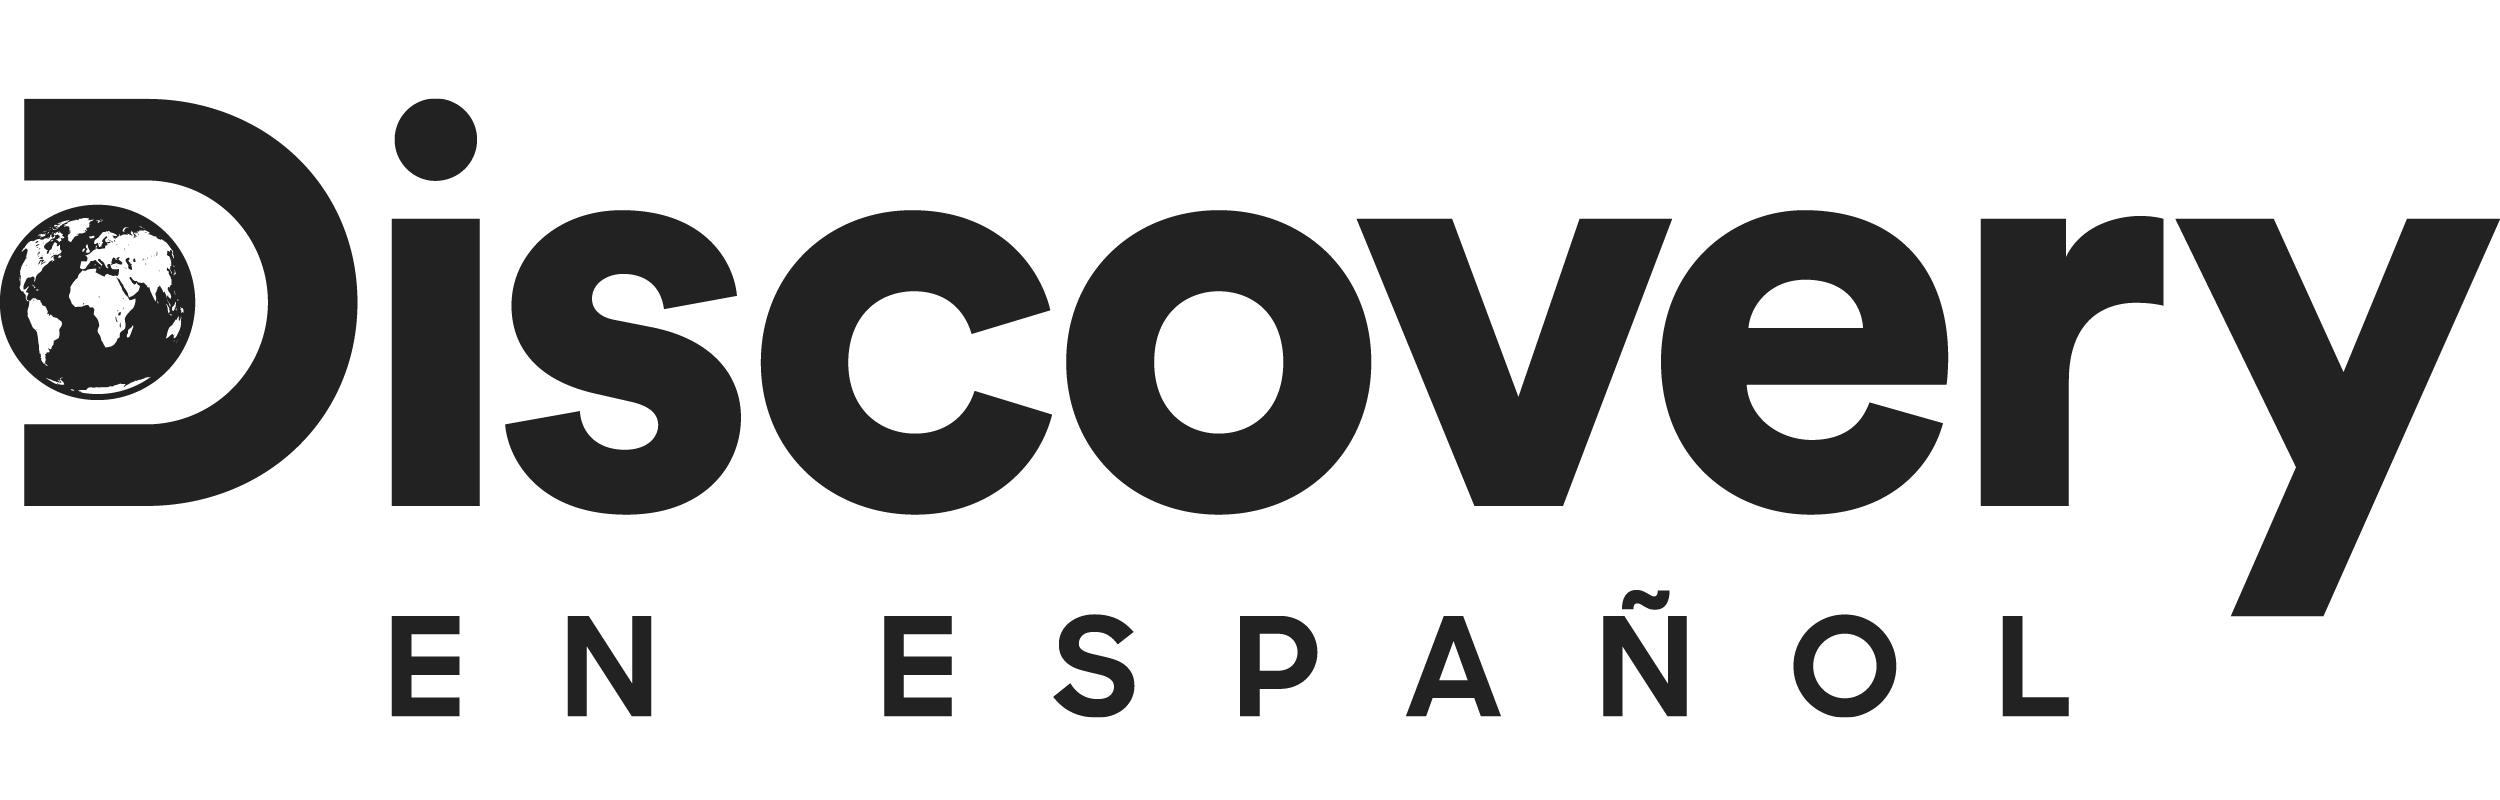 disc_espanol-1